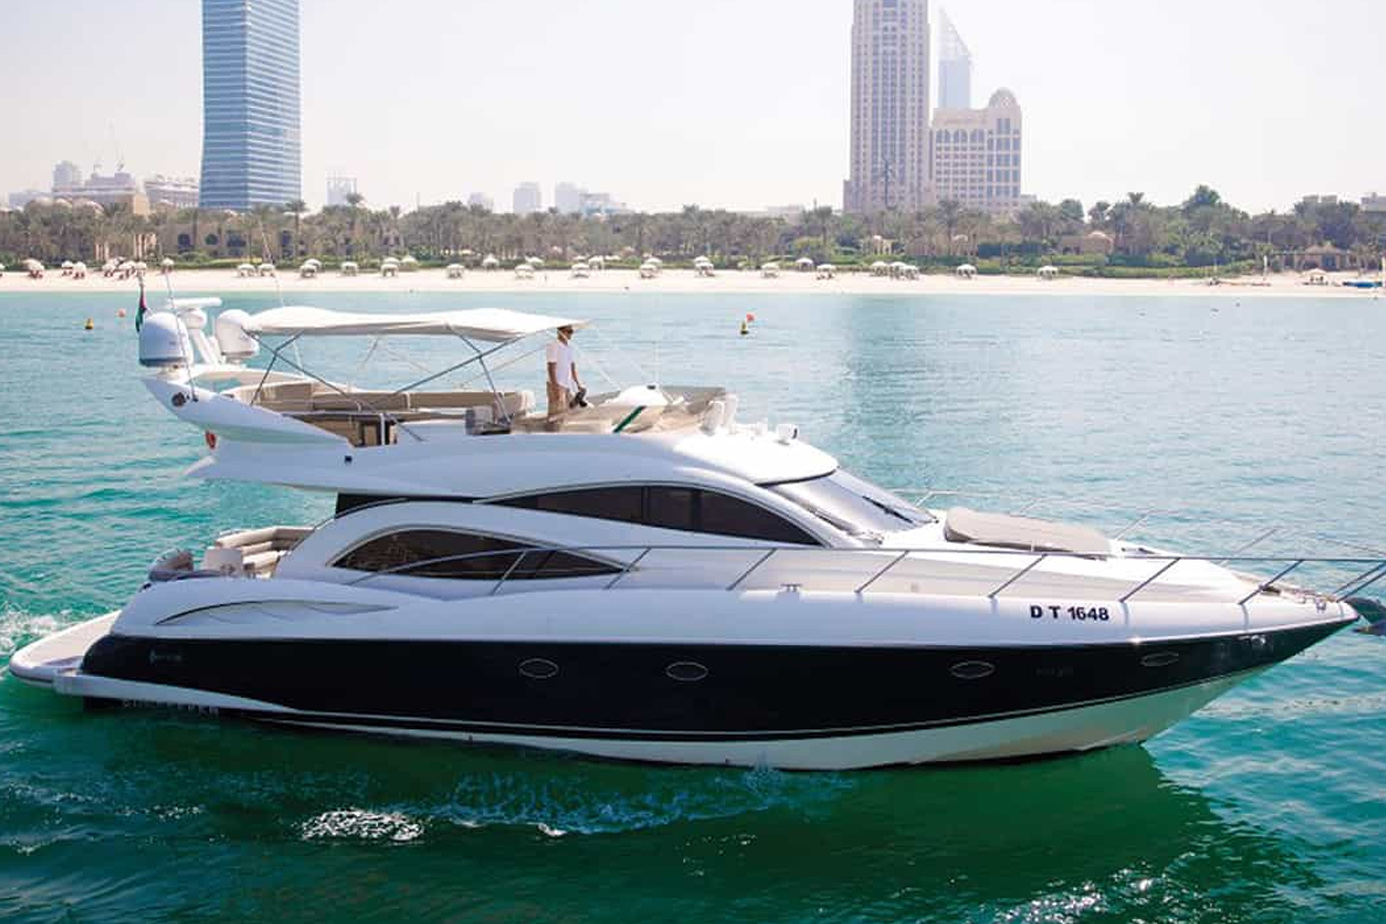 55ft yacht - yacht rentals dubai